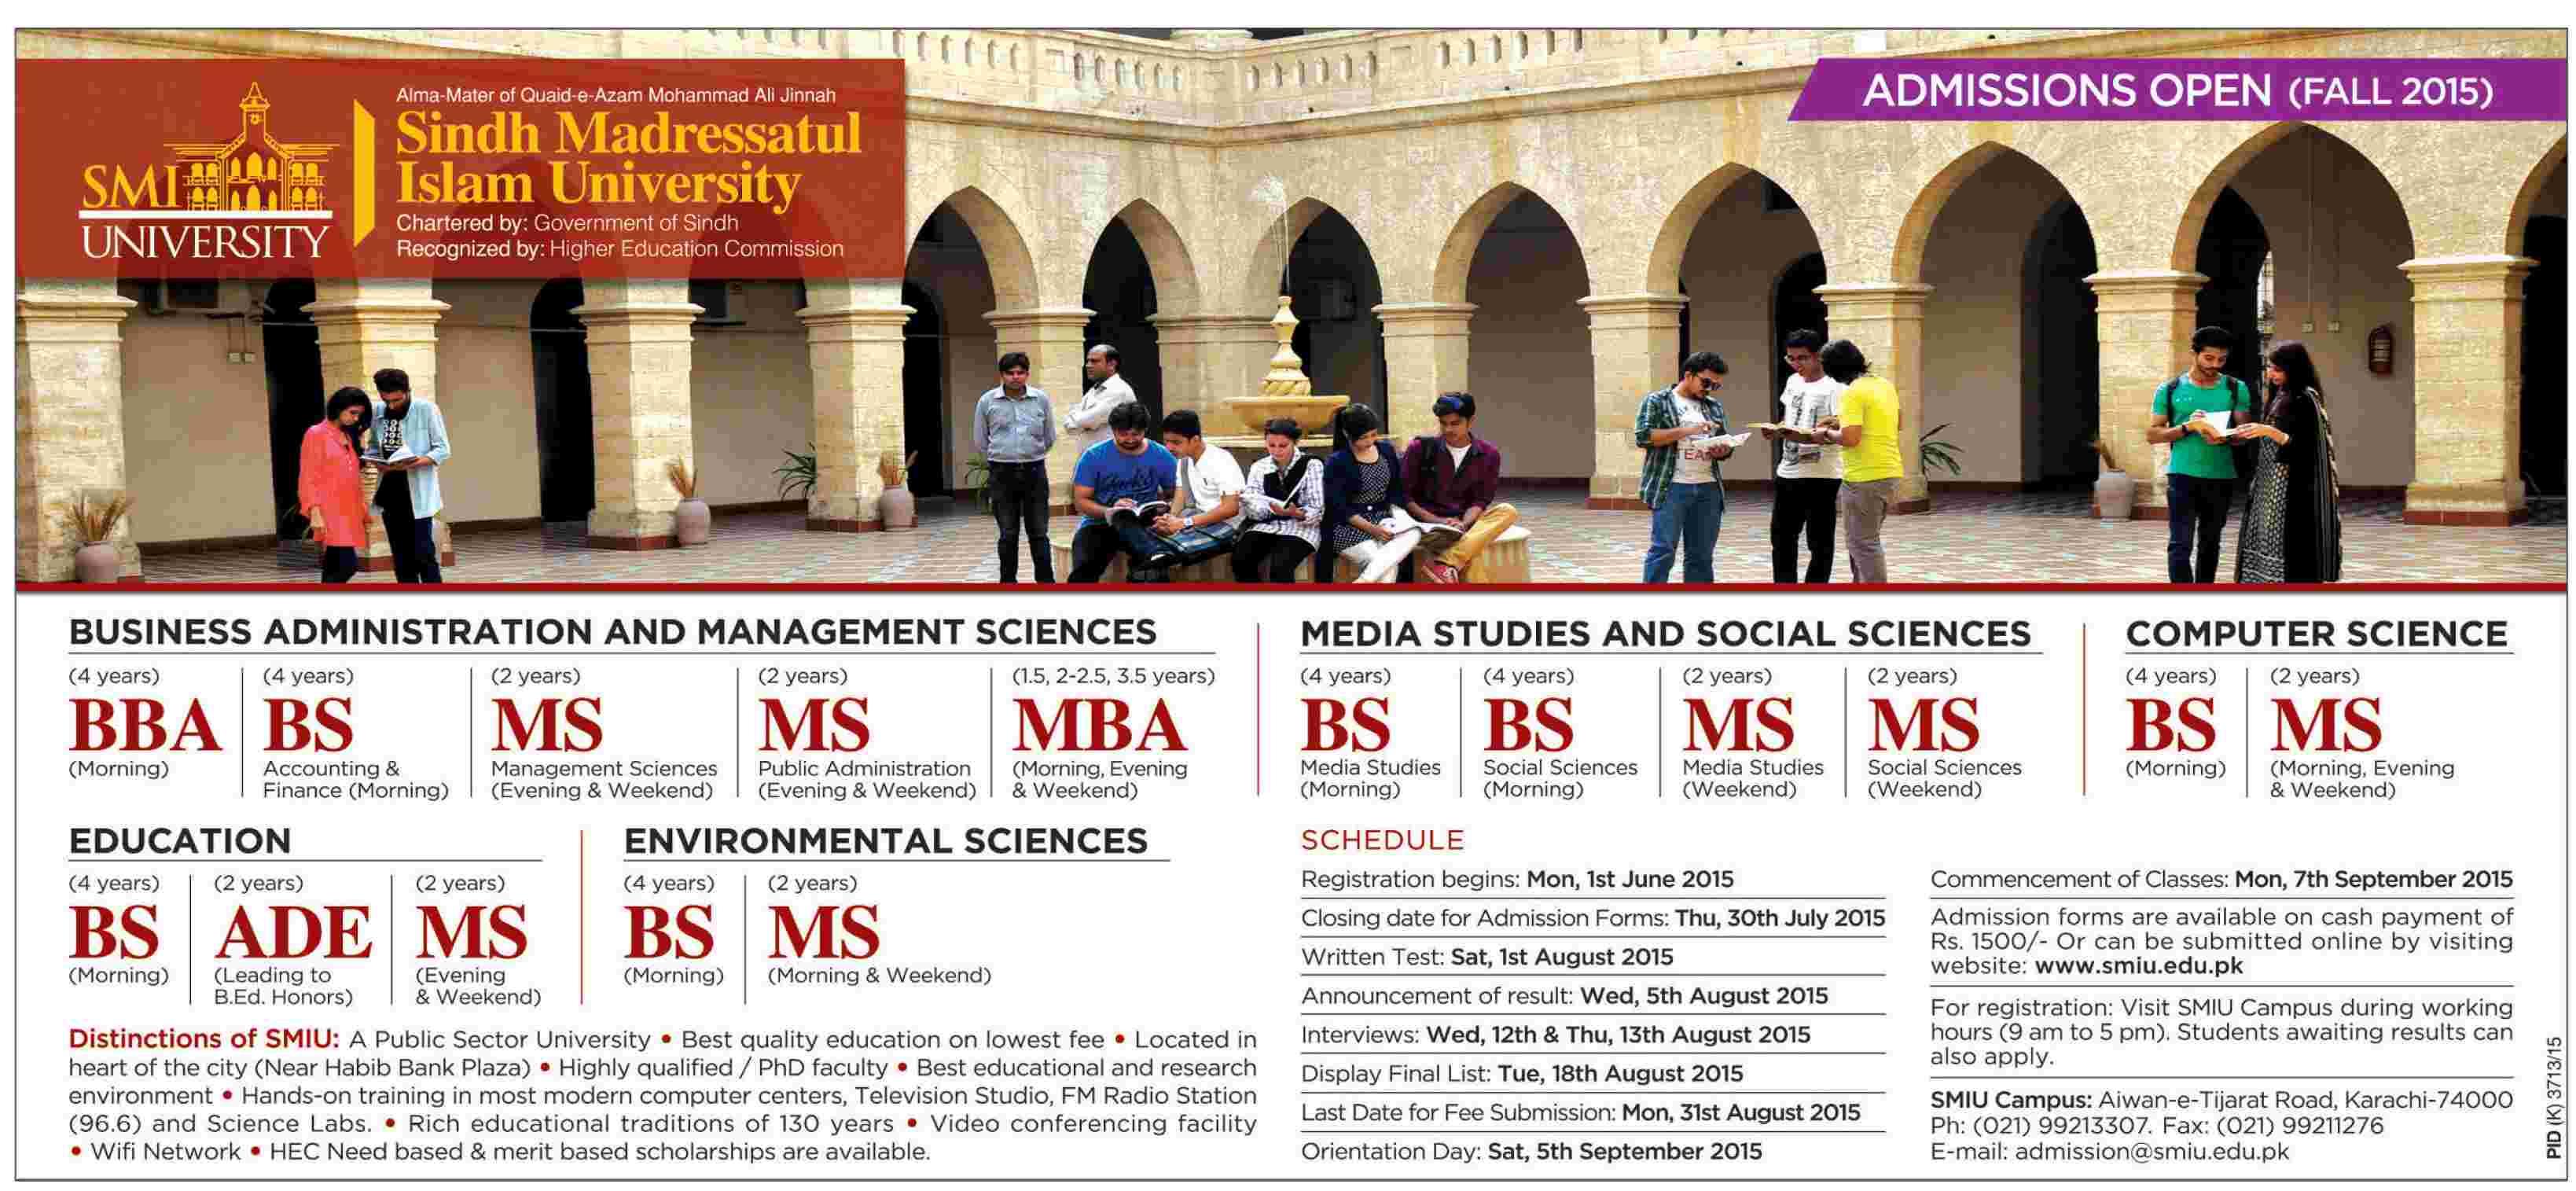 indh Madressatul Islam SMI University Fall Admission 2015 Form, Criteriaindh Madressatul Islam SMI University Fall Admission 2015 Form, Criteria